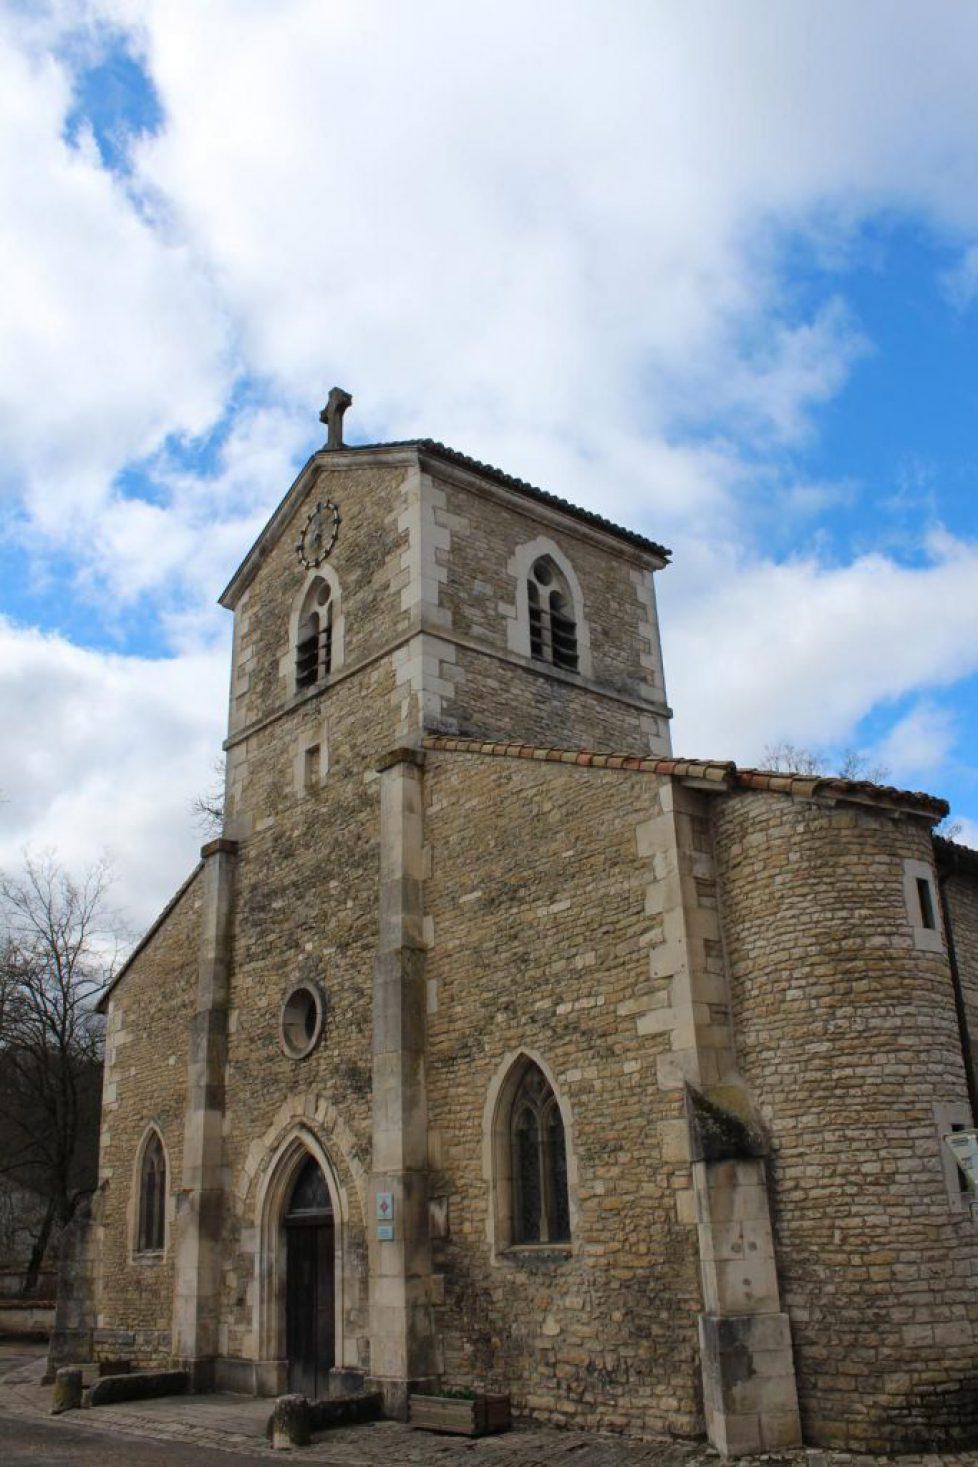 Domremy eglise saint remy